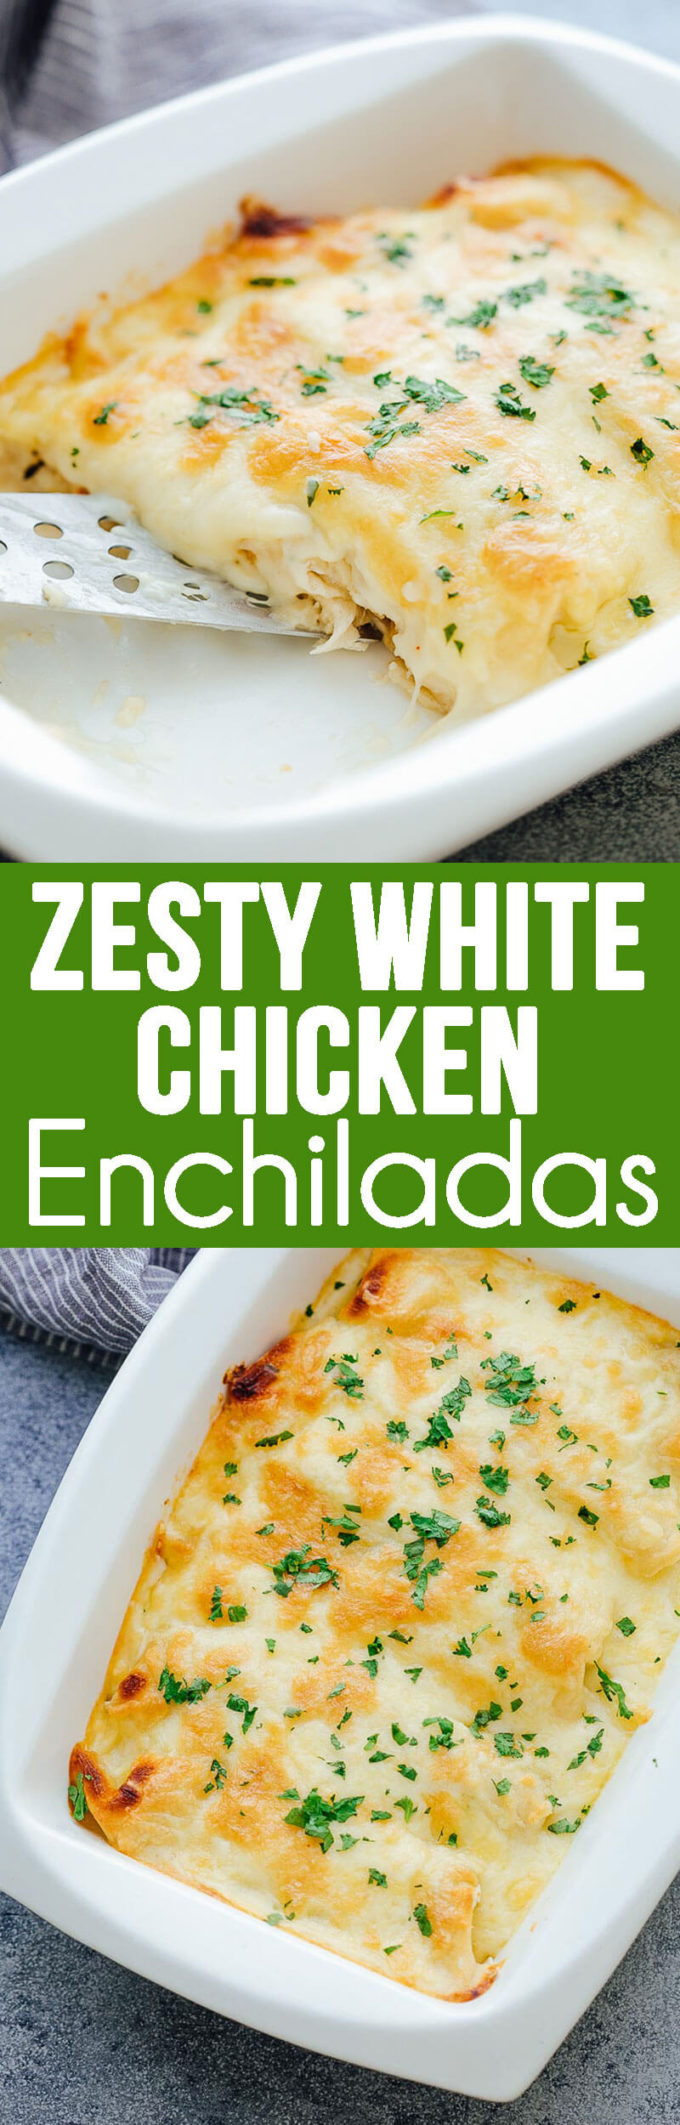 Zesty White Chicken Enchiladas, delicious and easy enchiladas.